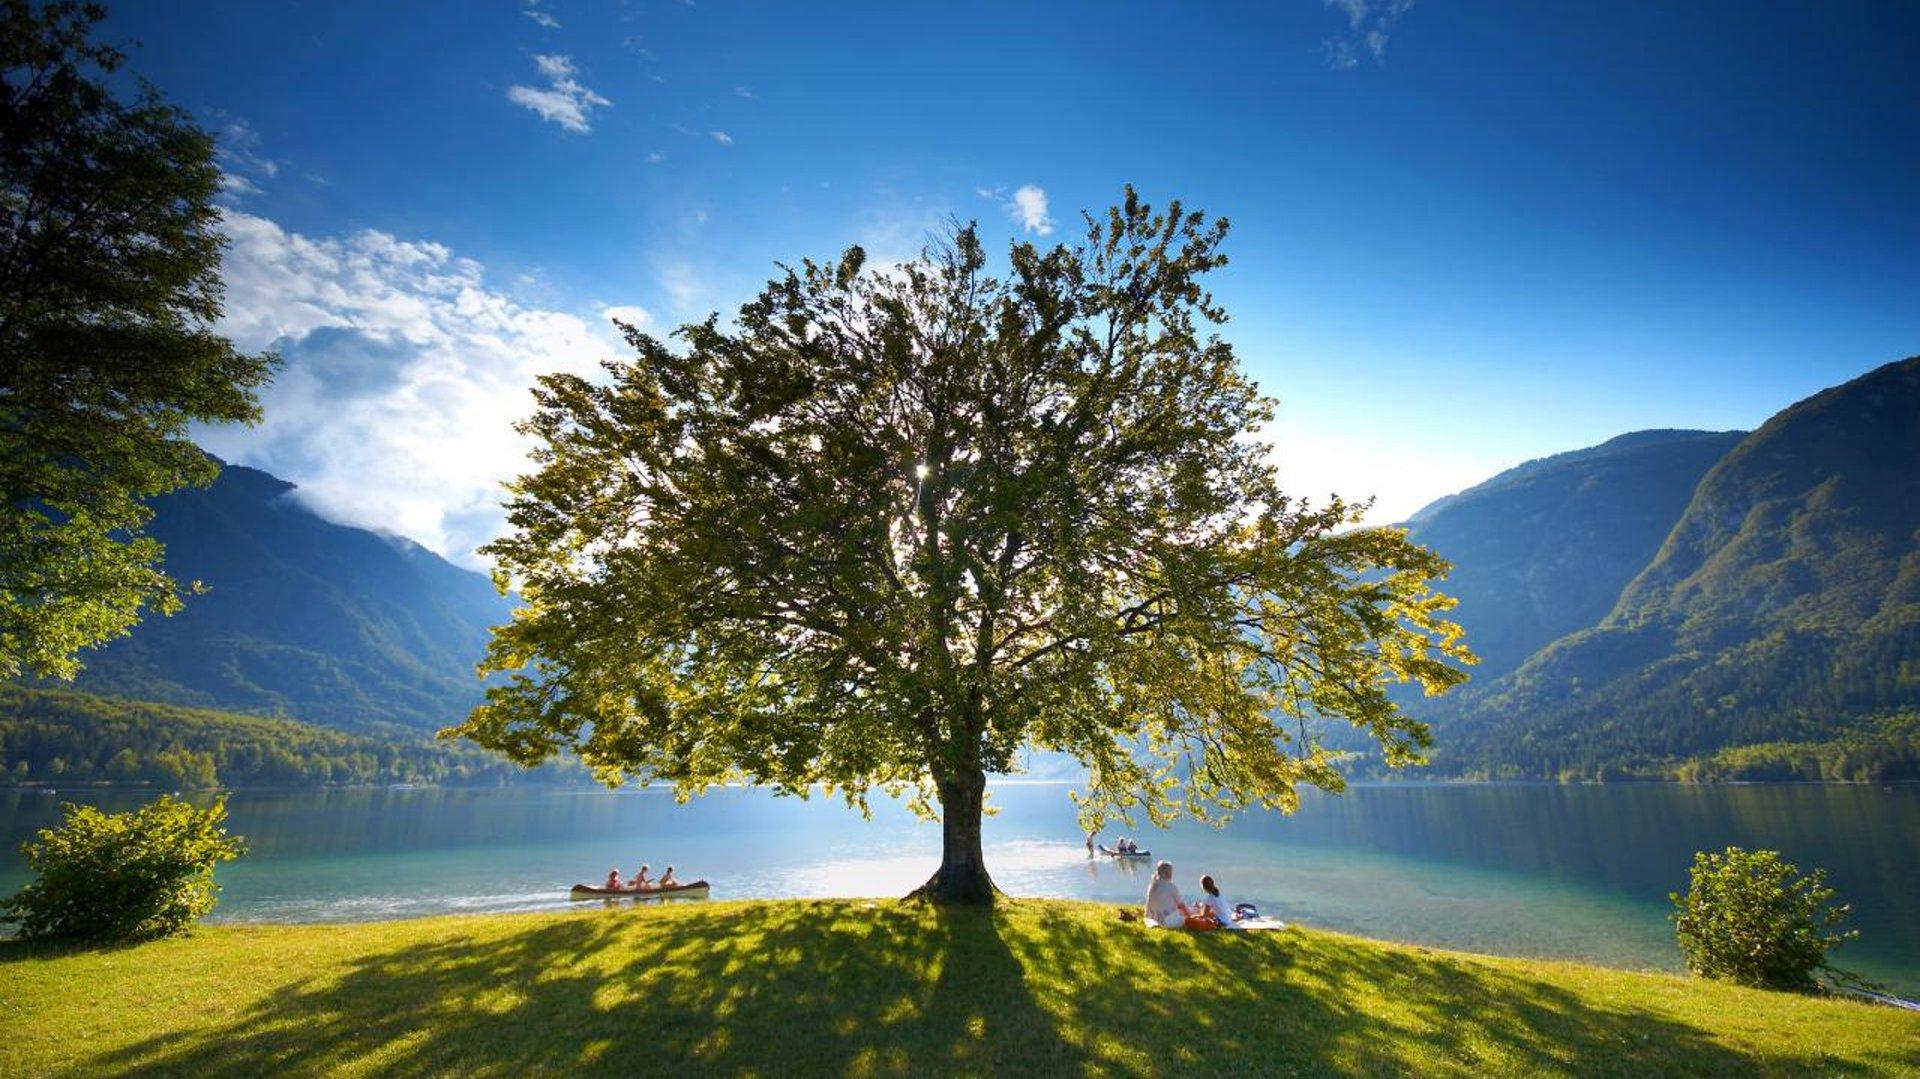 Lake Bohinj - day trips from Ljubljana